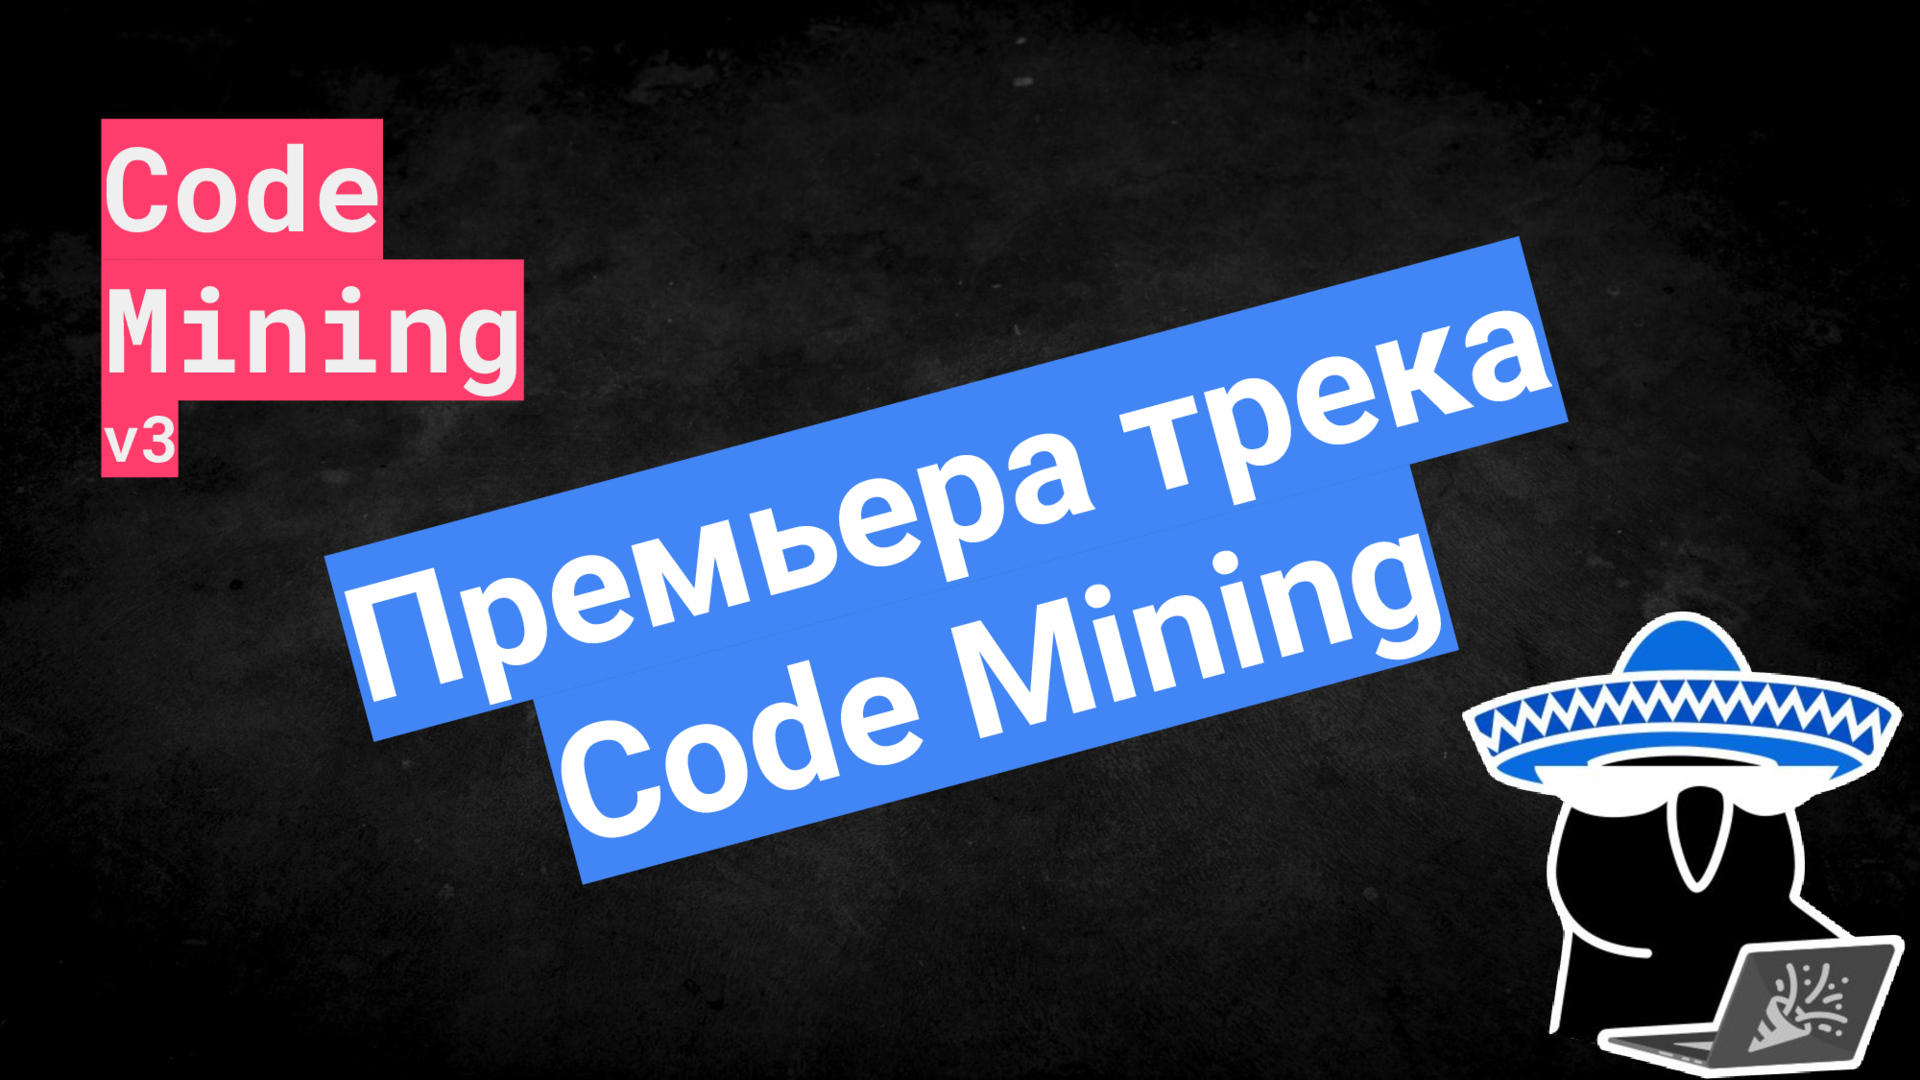 Code Mining